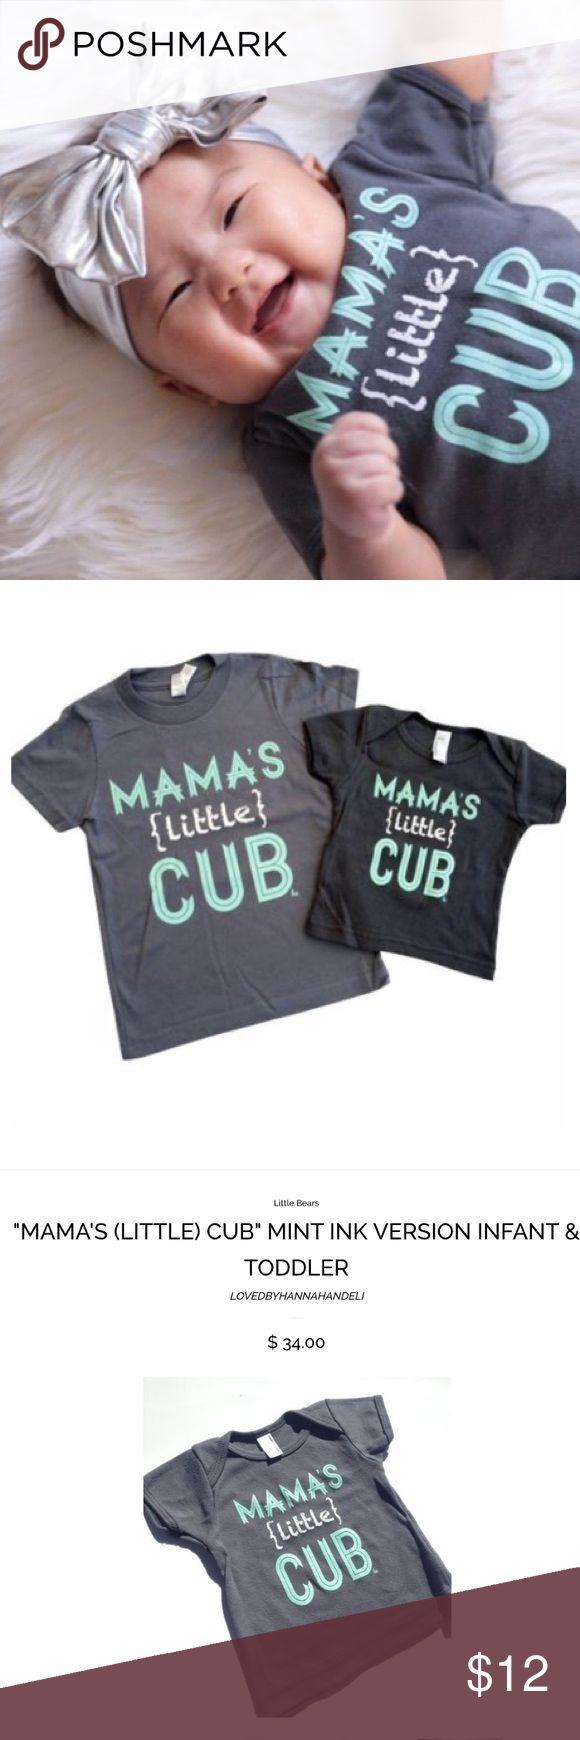 Little cub t shirt Mamas cub t shirt. SO CUTE Shirts & Tops Tees - Short Sleeve